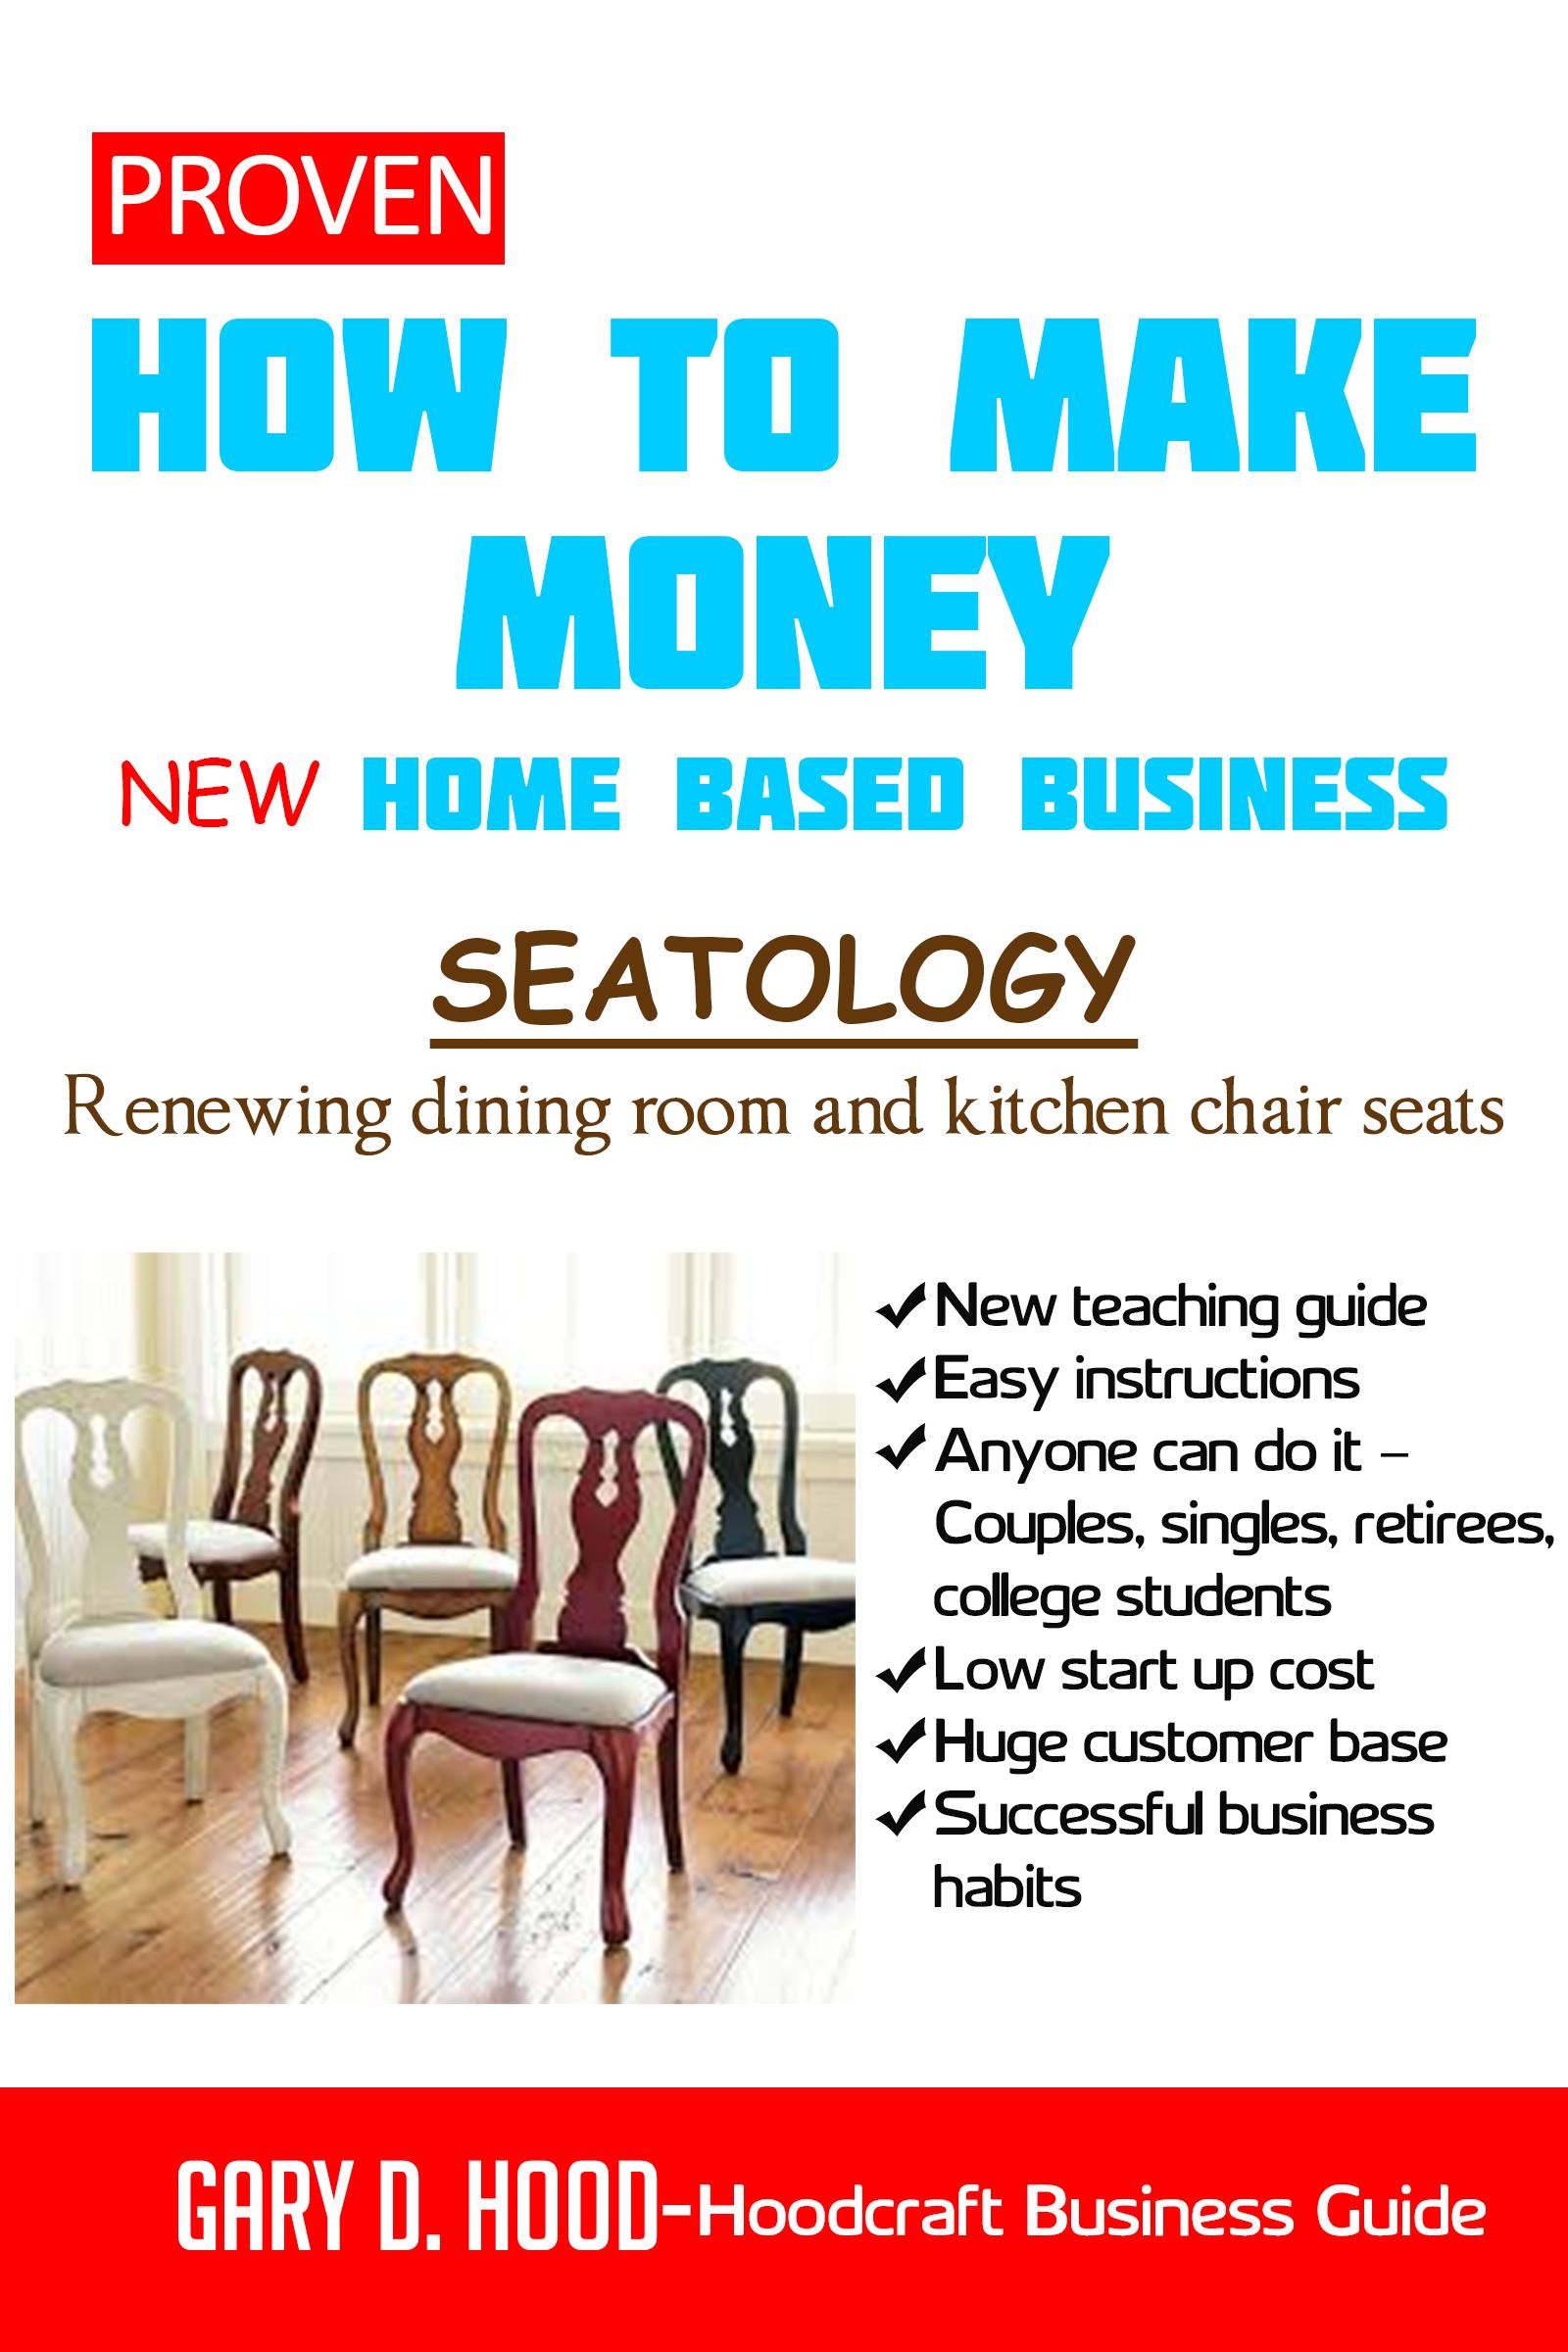 Smashwords – Proven: How to Make Money - Seatology - New Home Based ...